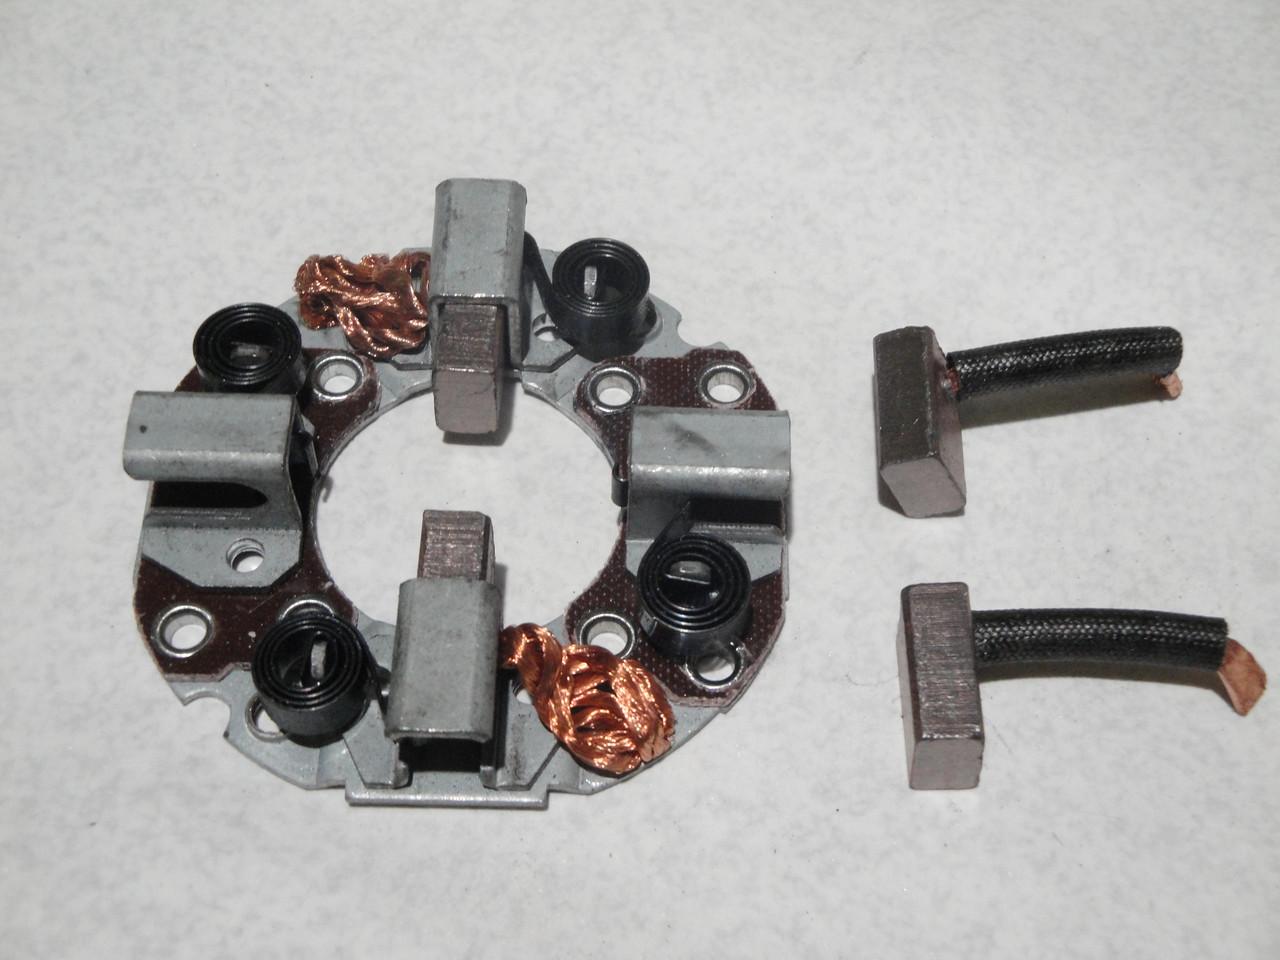 Щіткотримач стартера двигуна FUSO CANTER 659/859 JAPACO